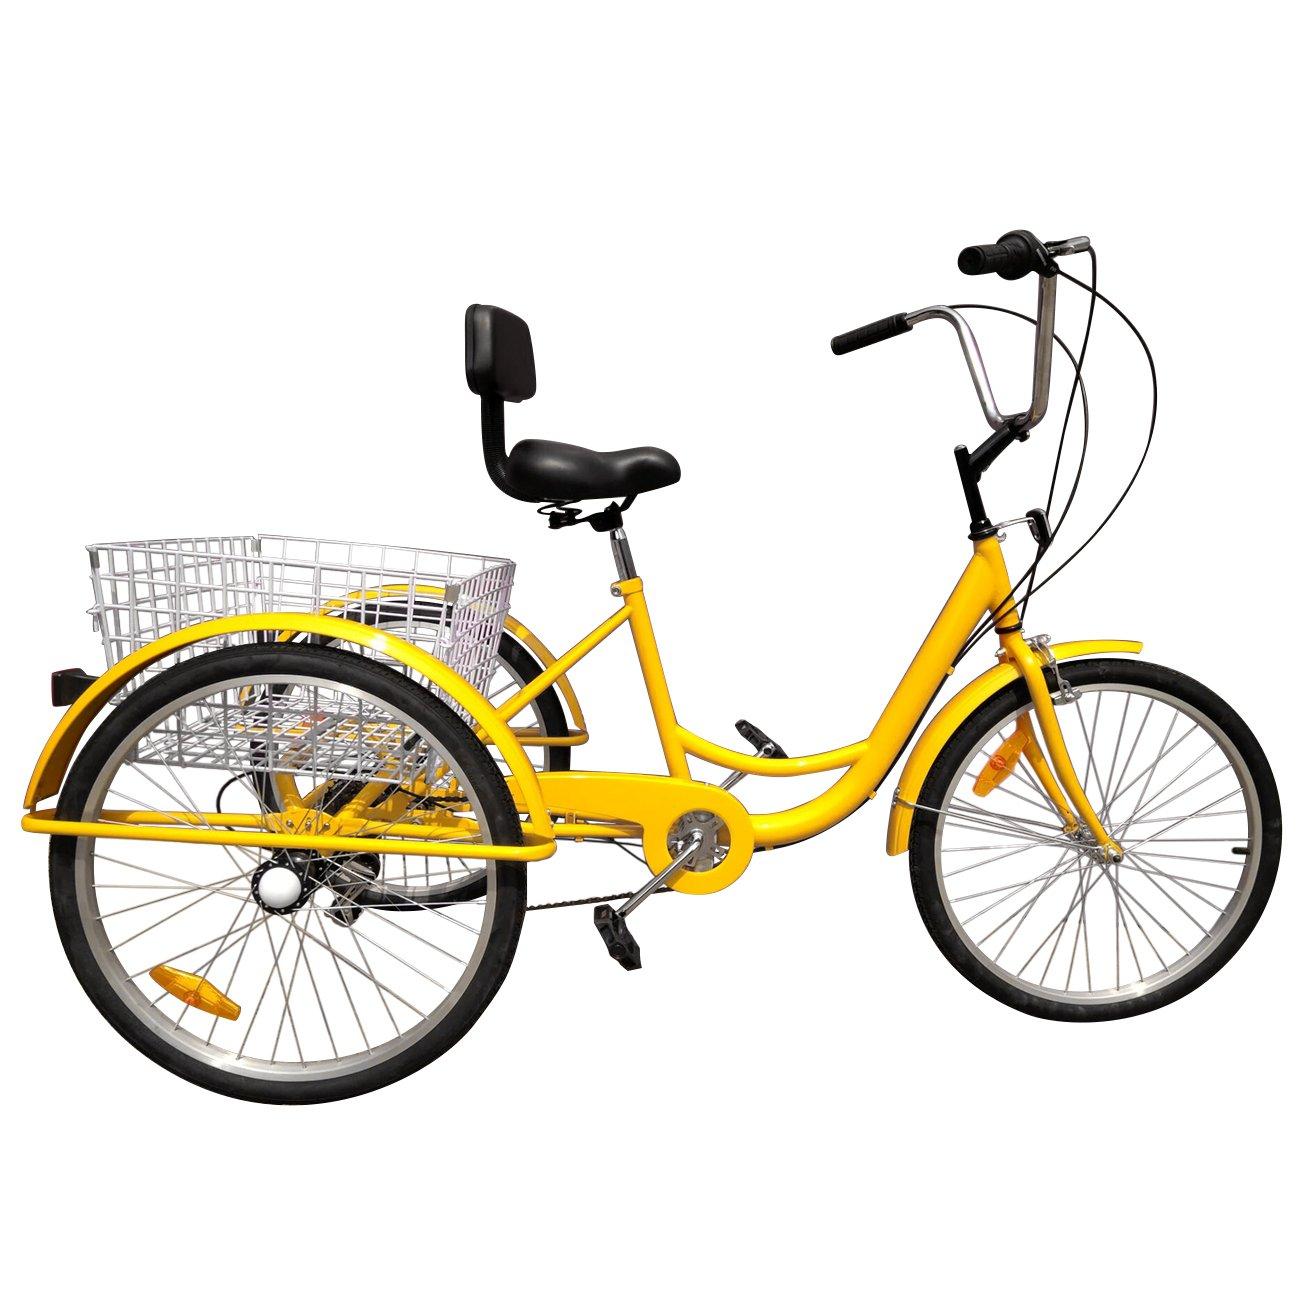 IglobalbuyYellow 24-Inch 6-Speed Adult Tricycle Trike 3-Wheel Bike Cruise Bike with Basket